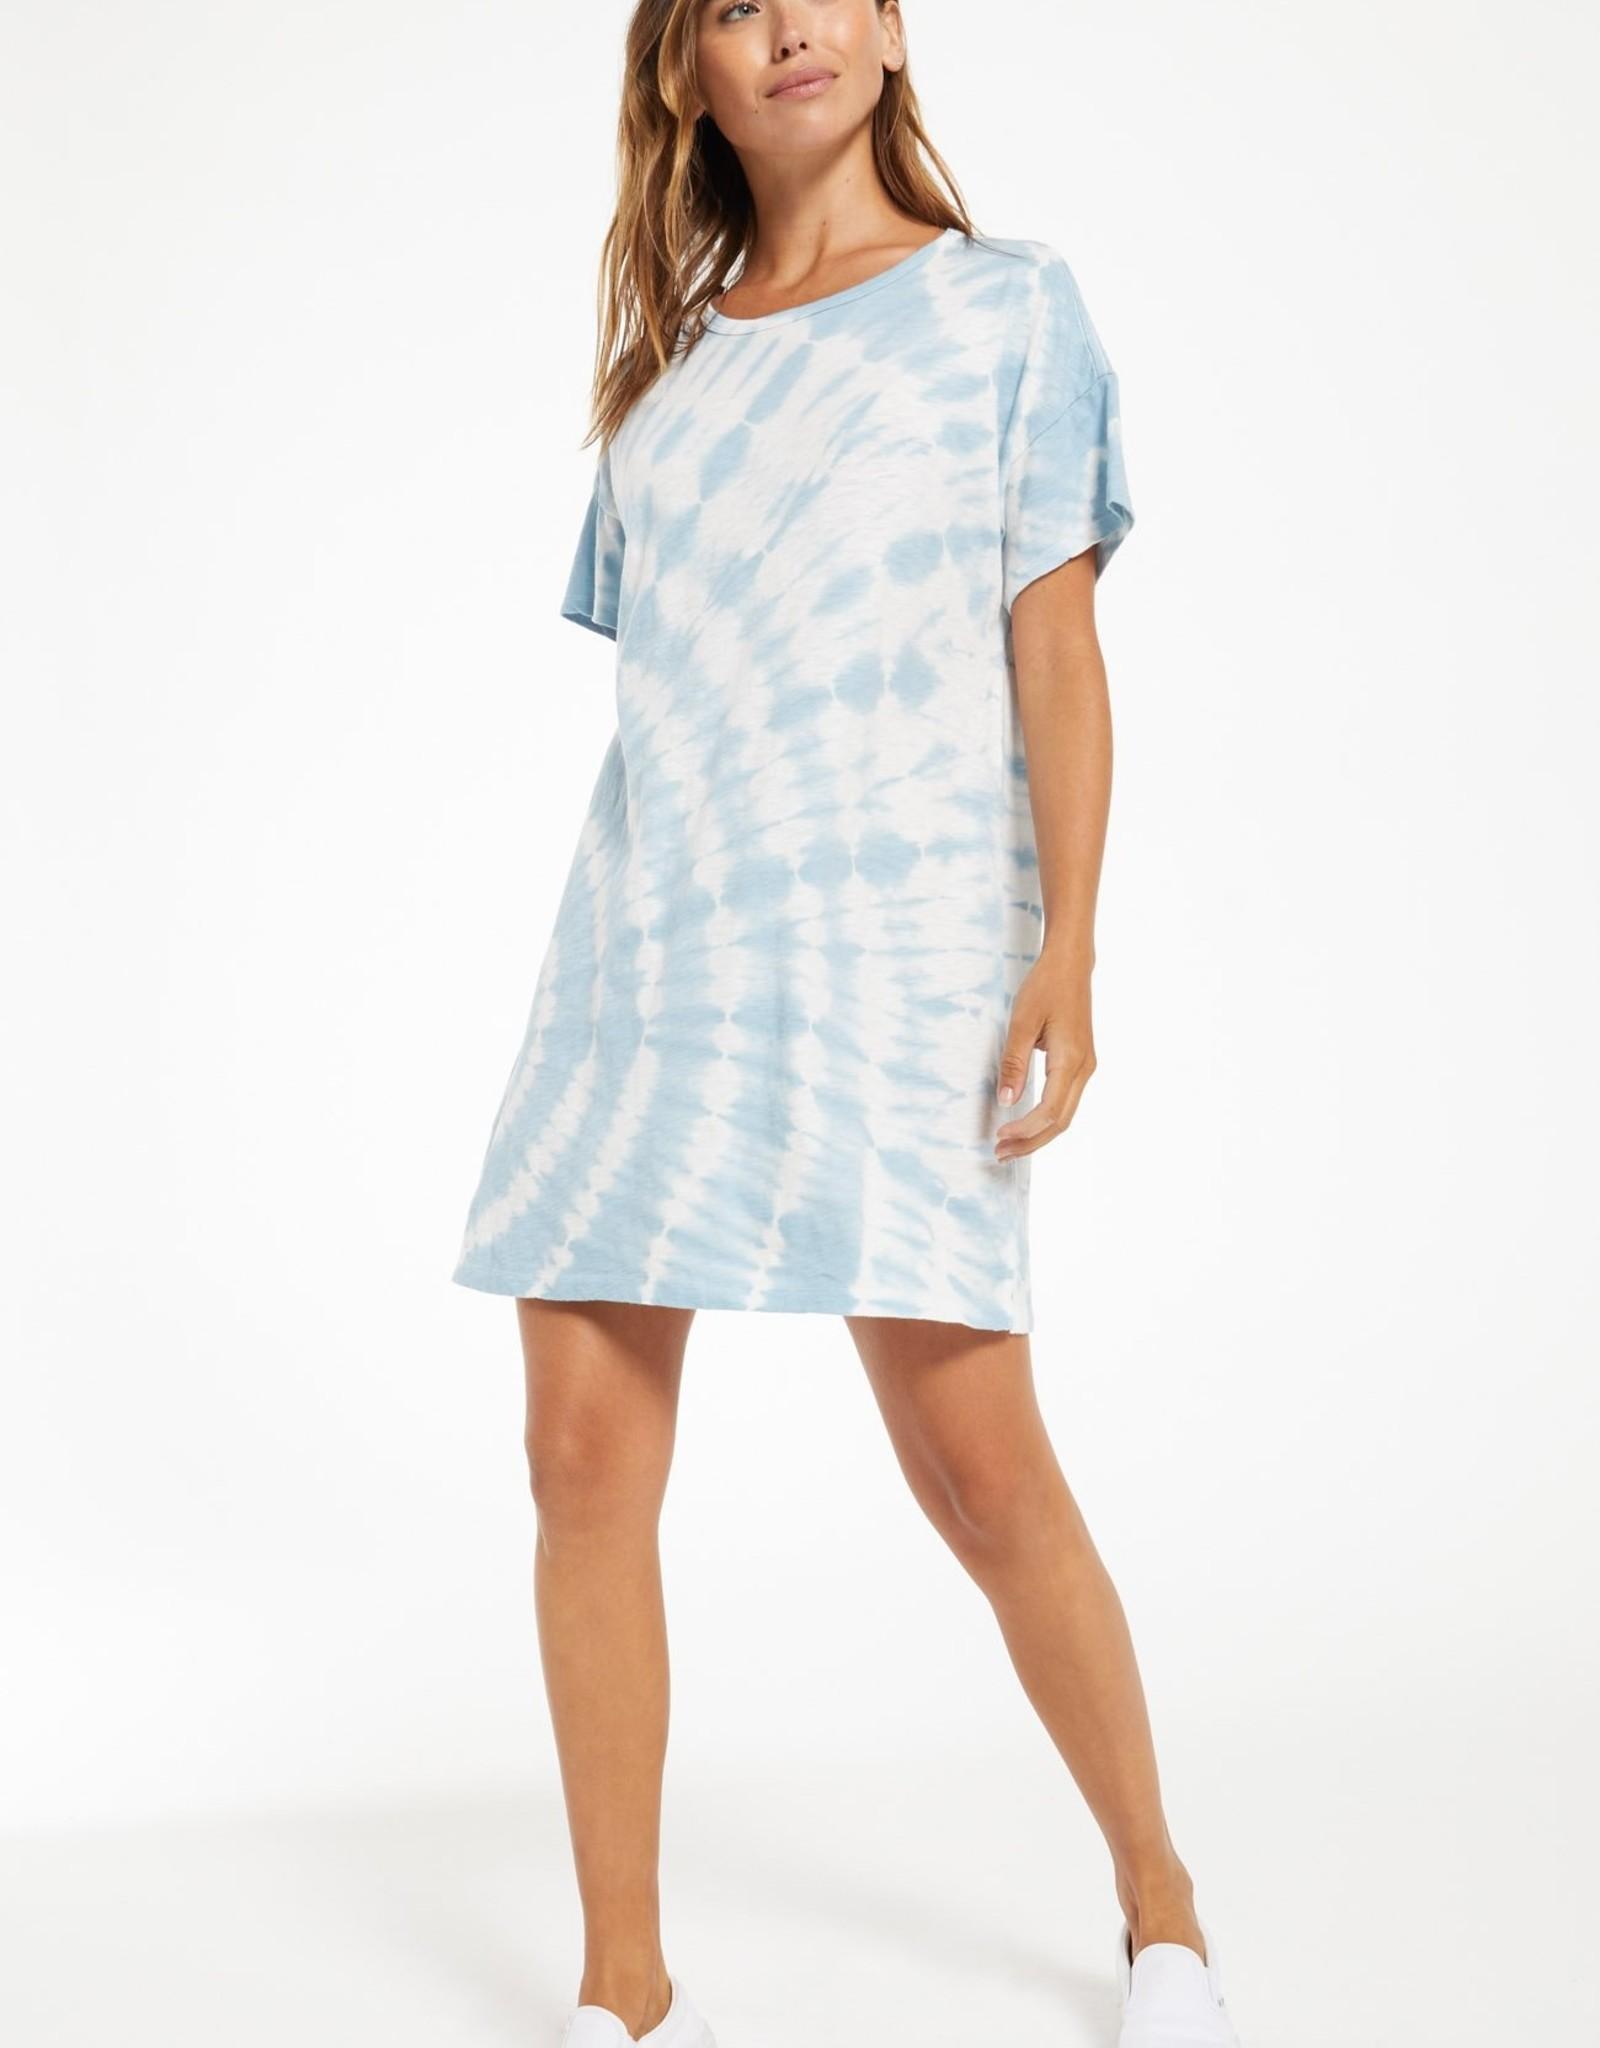 Z Supply Launa Swirl Tie-Dye Dress